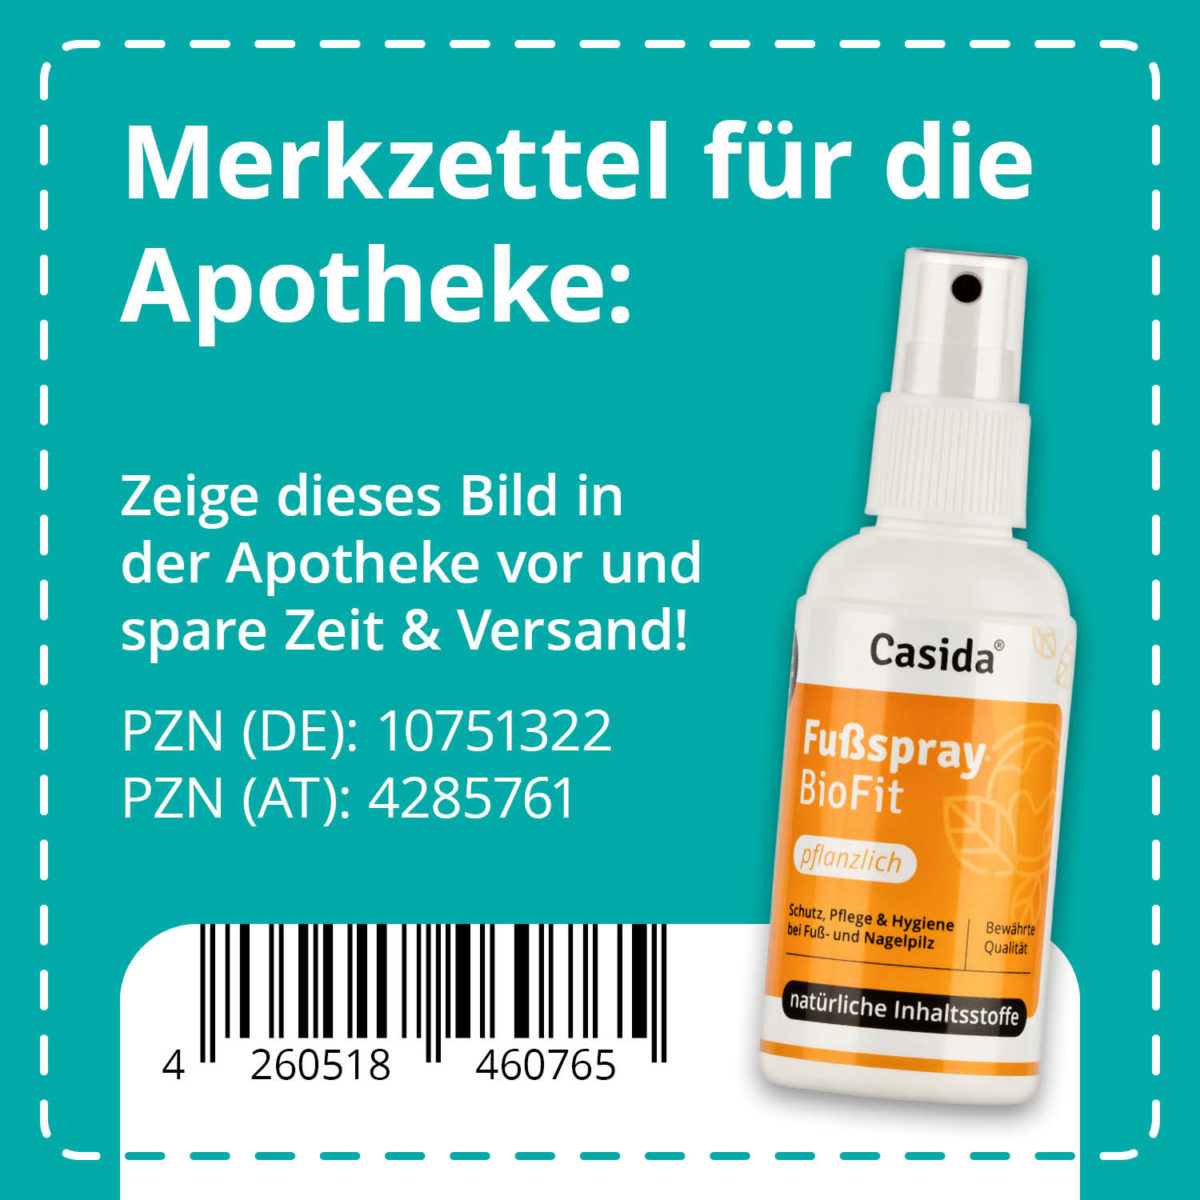 Casida Fußspray BioFit Pflanzlich 100 ml PZN DE 10751322 PZN AT 4285761 UVP 14,95 € EAN 4260518460765